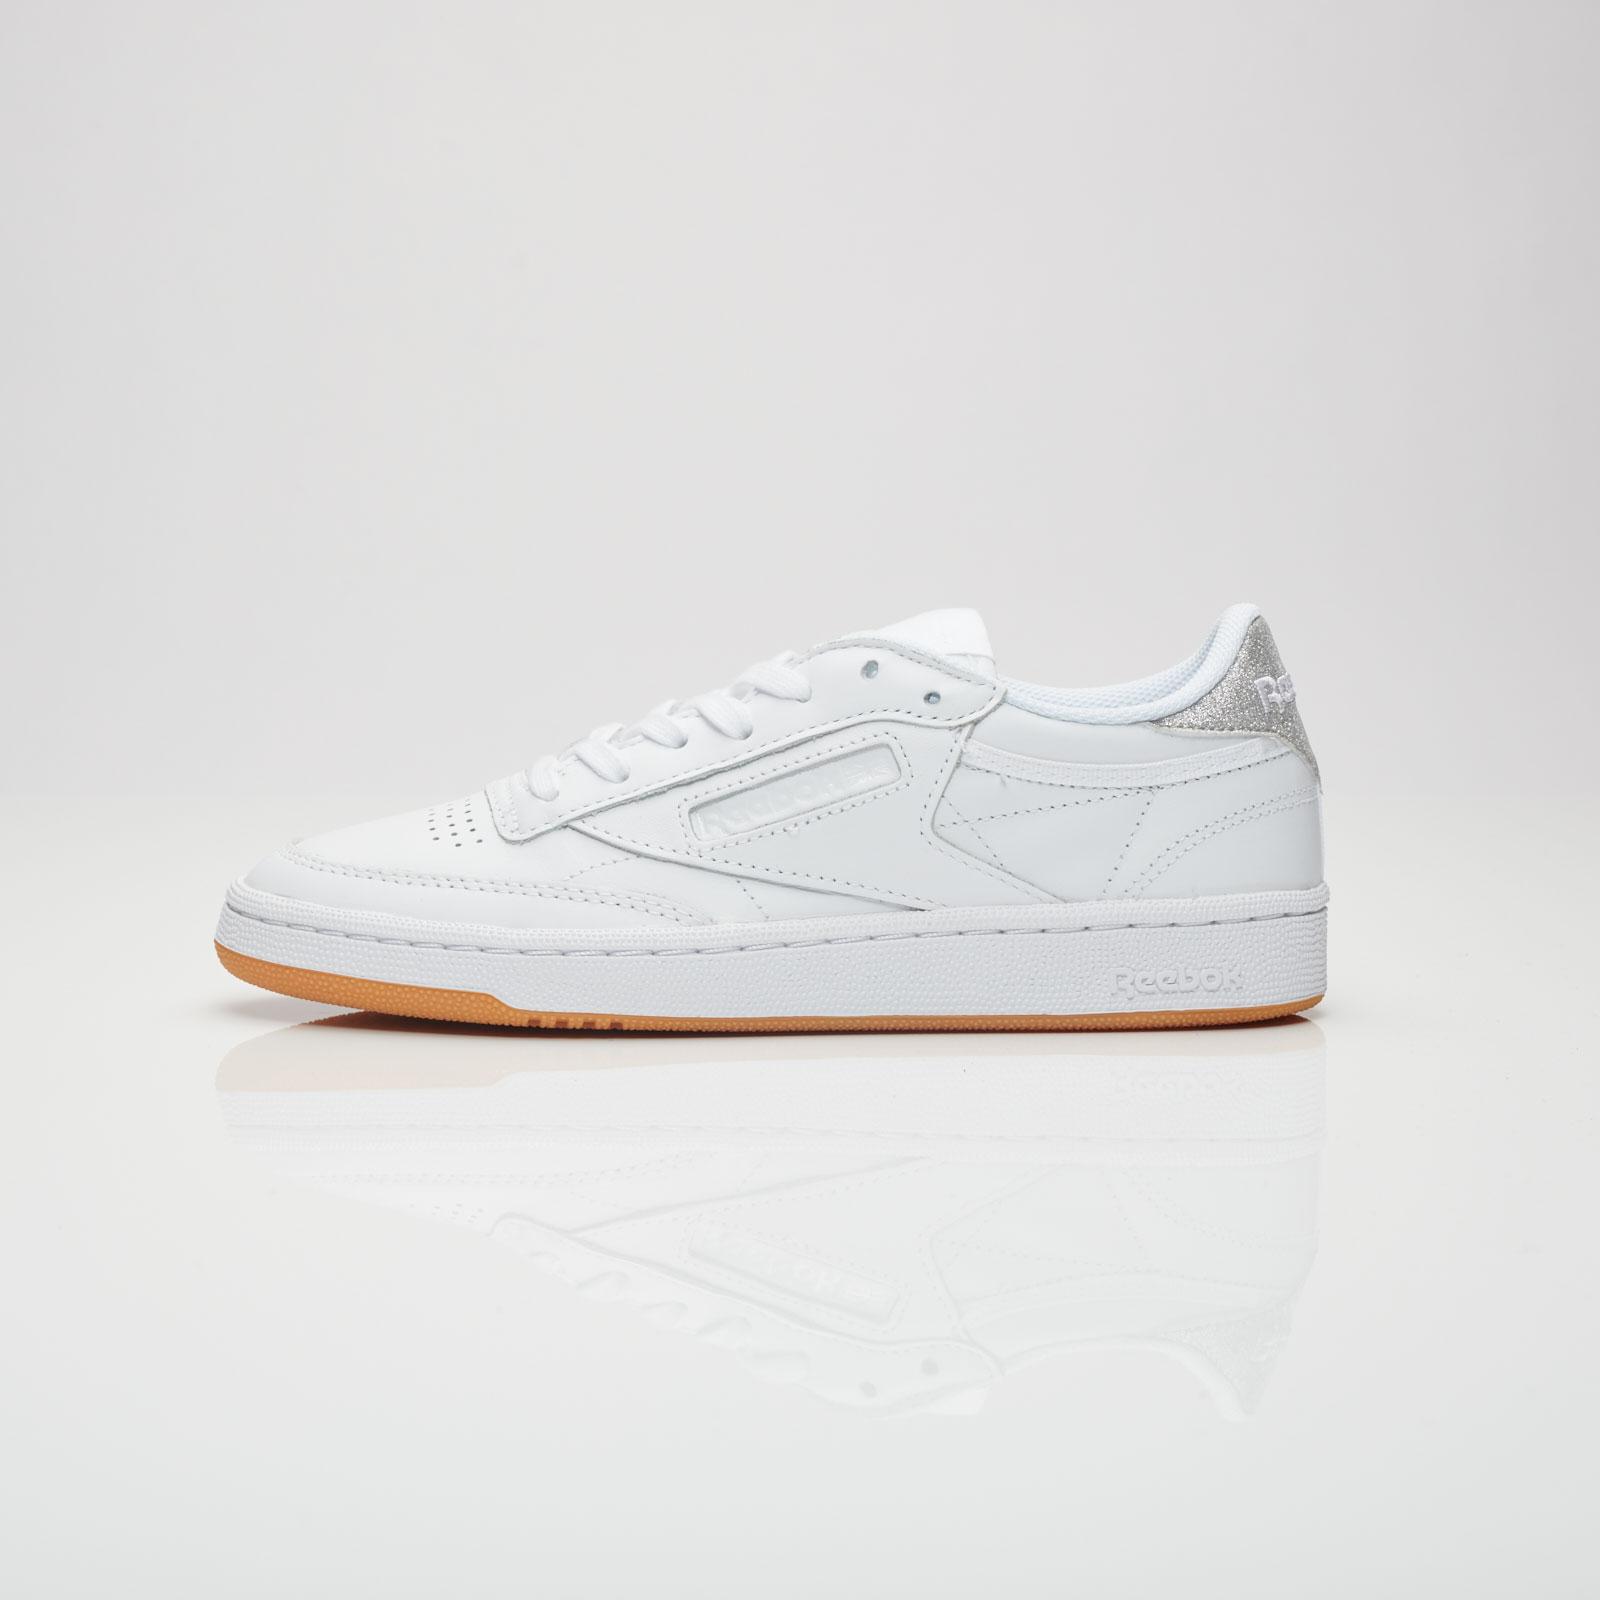 eb30237c1ad Reebok Club C 85 Diamond - Bd4427 - Sneakersnstuff